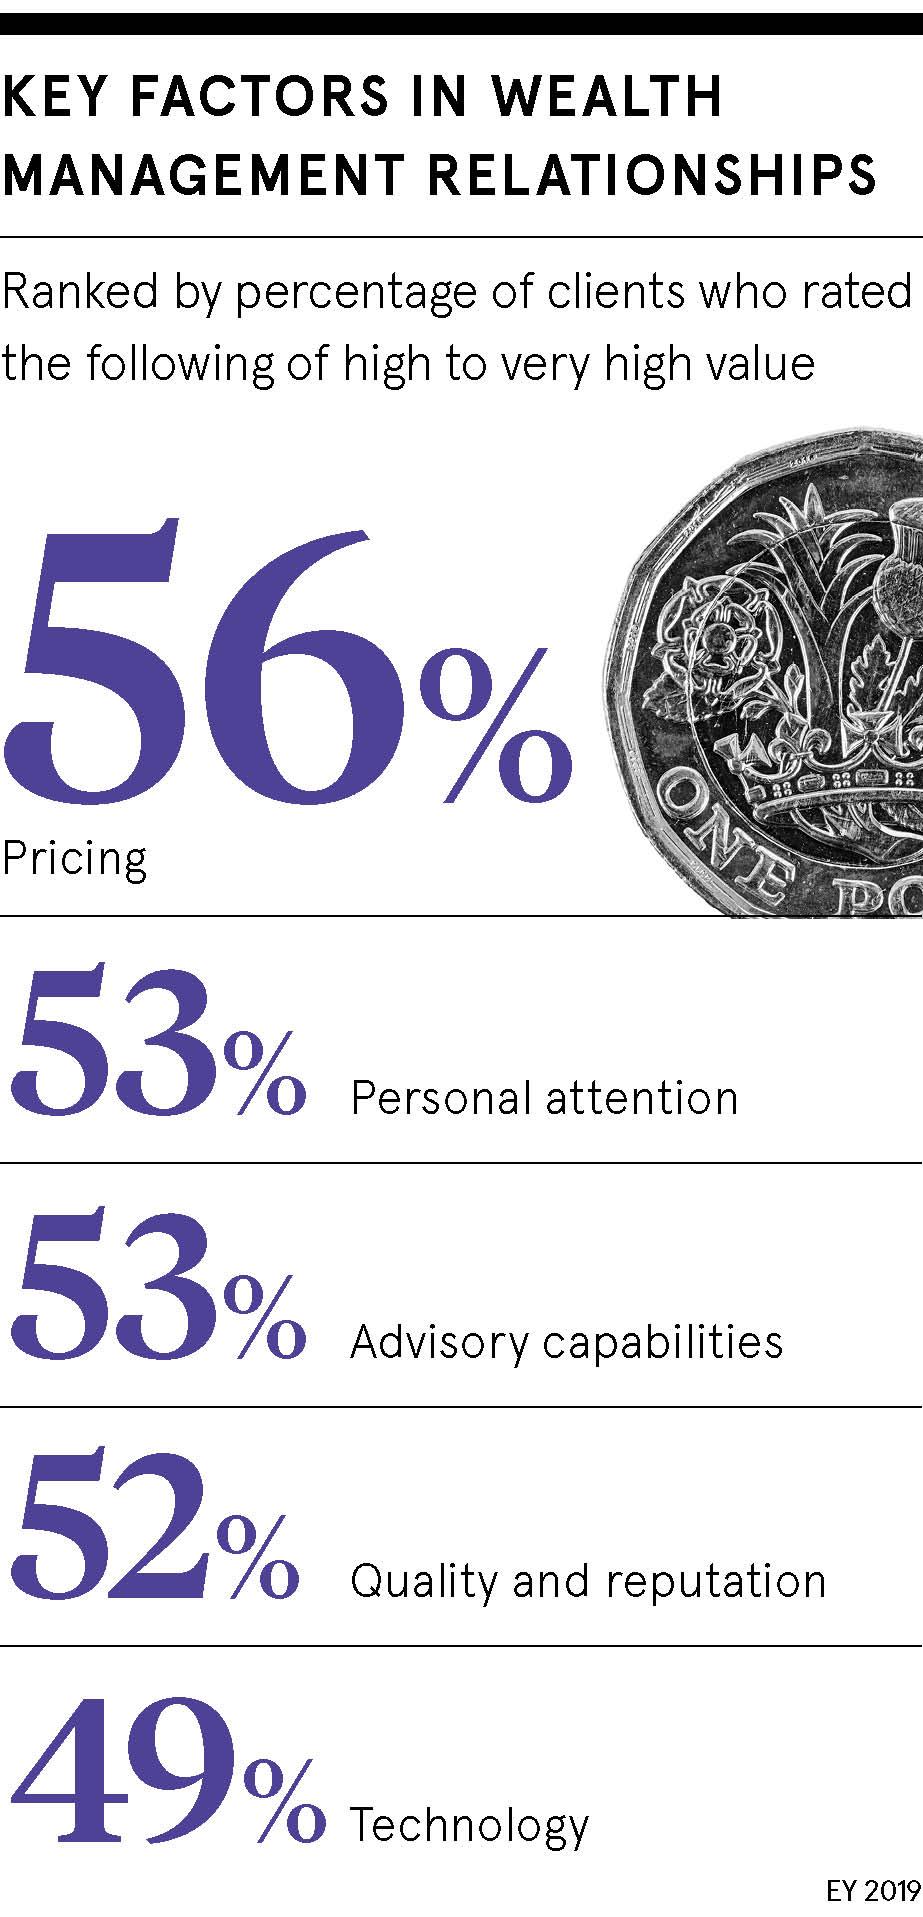 Key factors in wealth management relationships